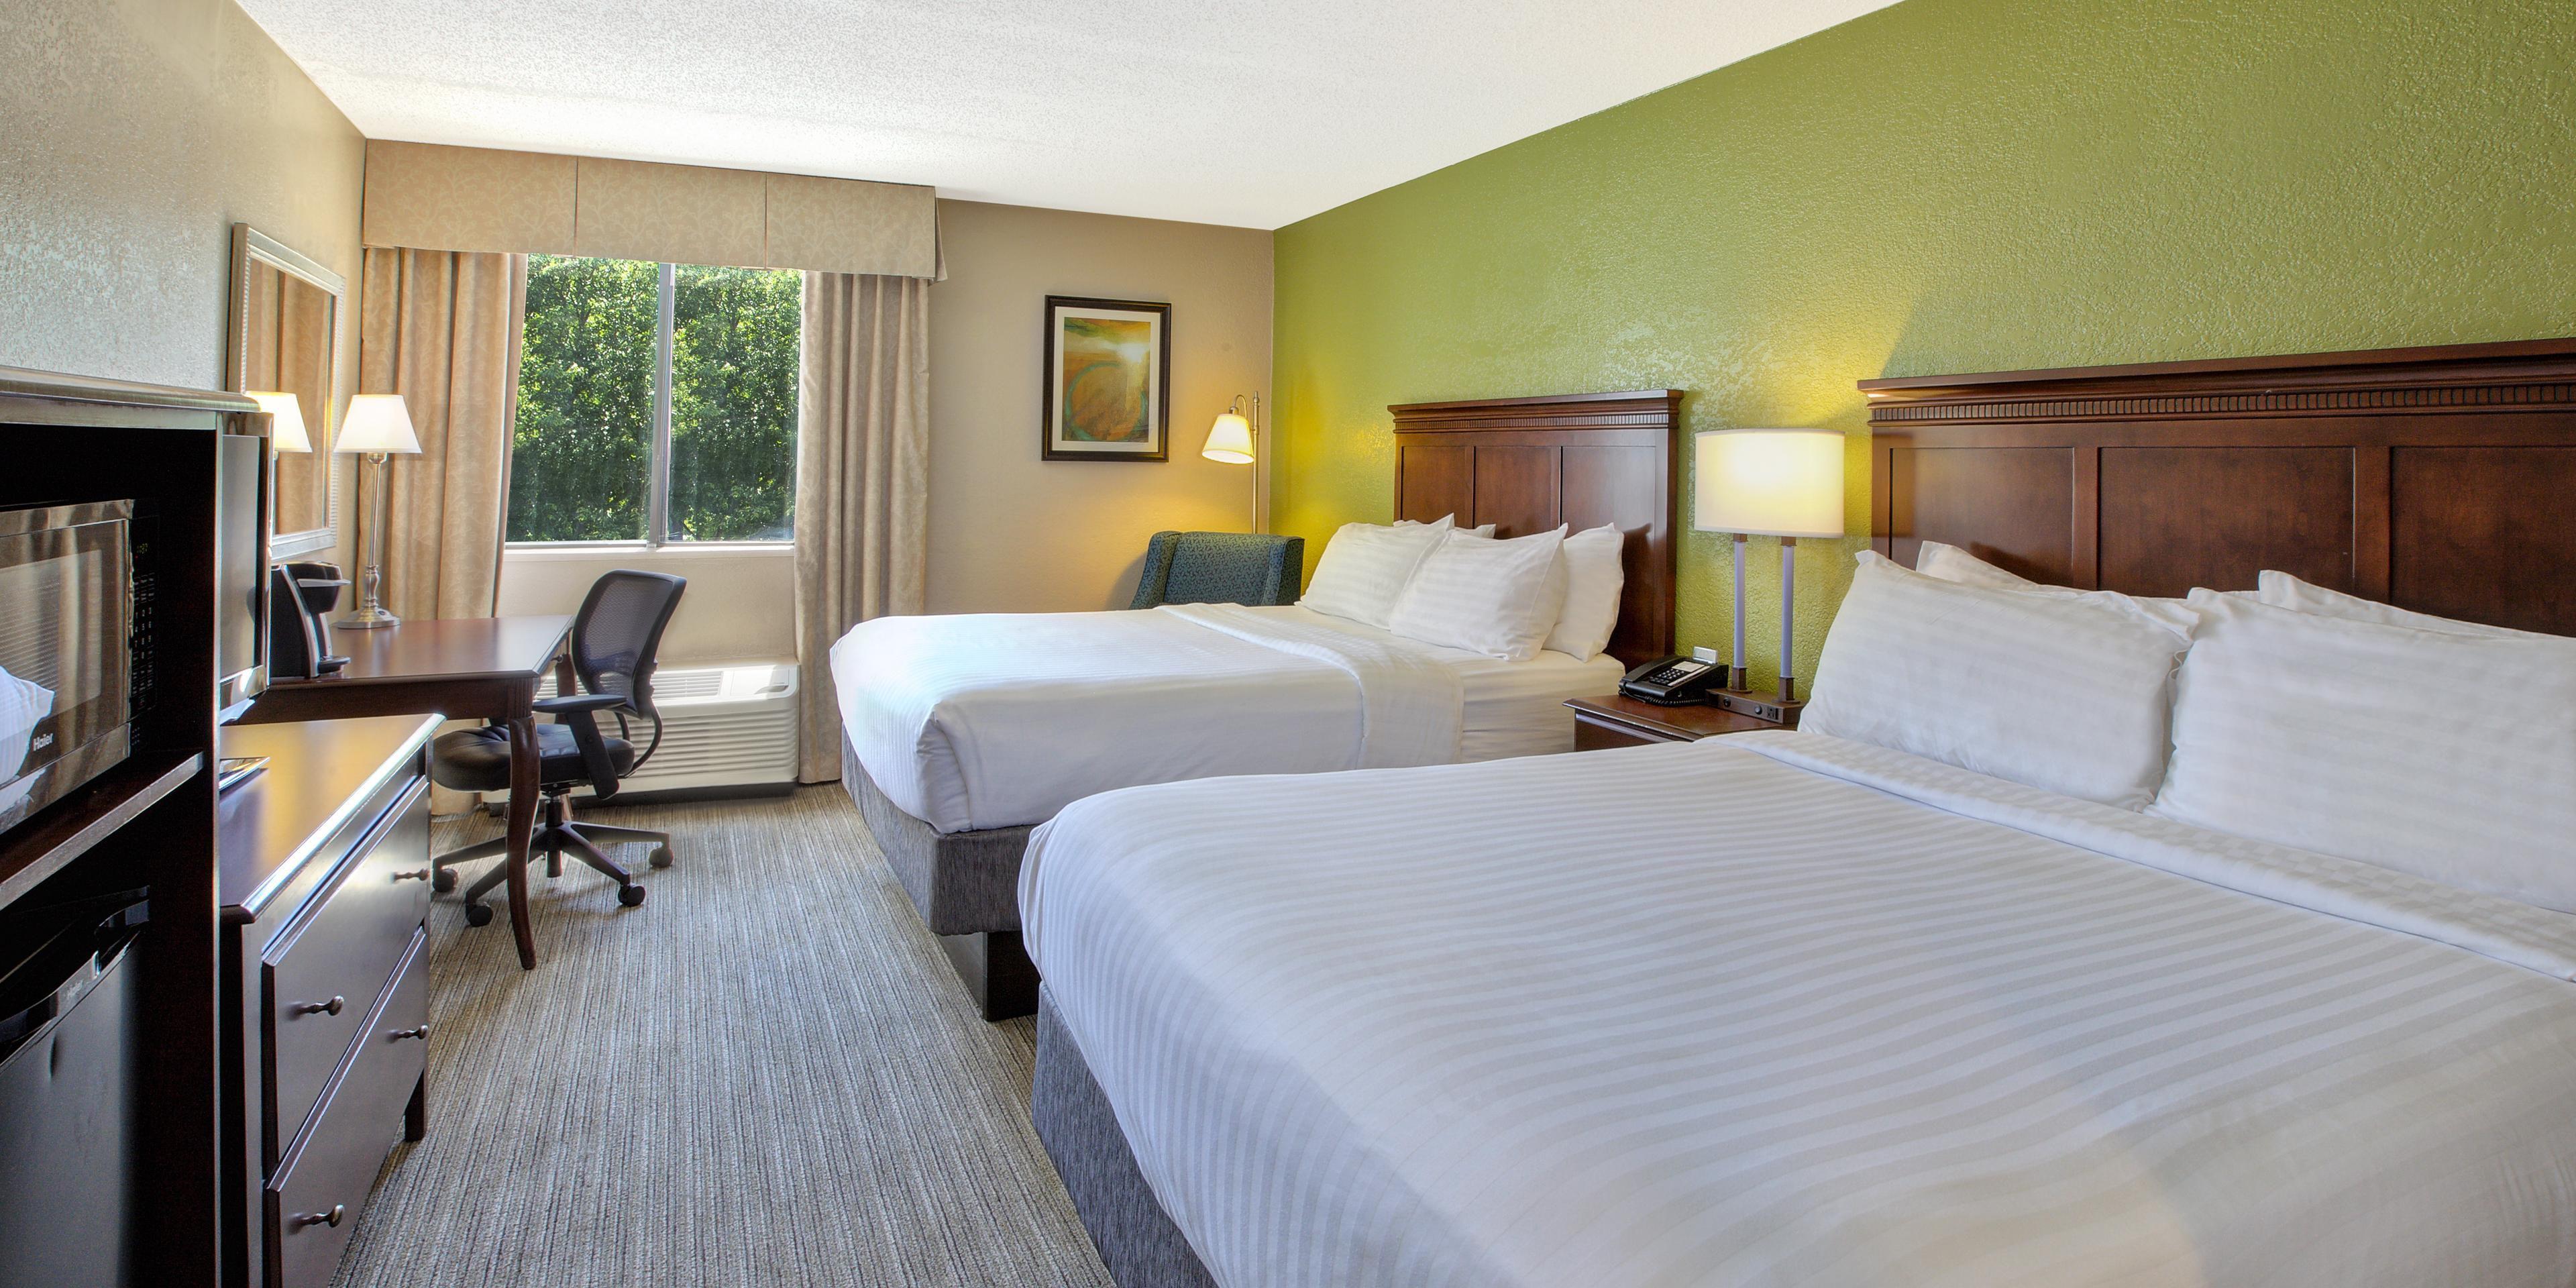 Holiday Inn Express U0026 Suites Germantown   Gaithersburg Hotel By IHG